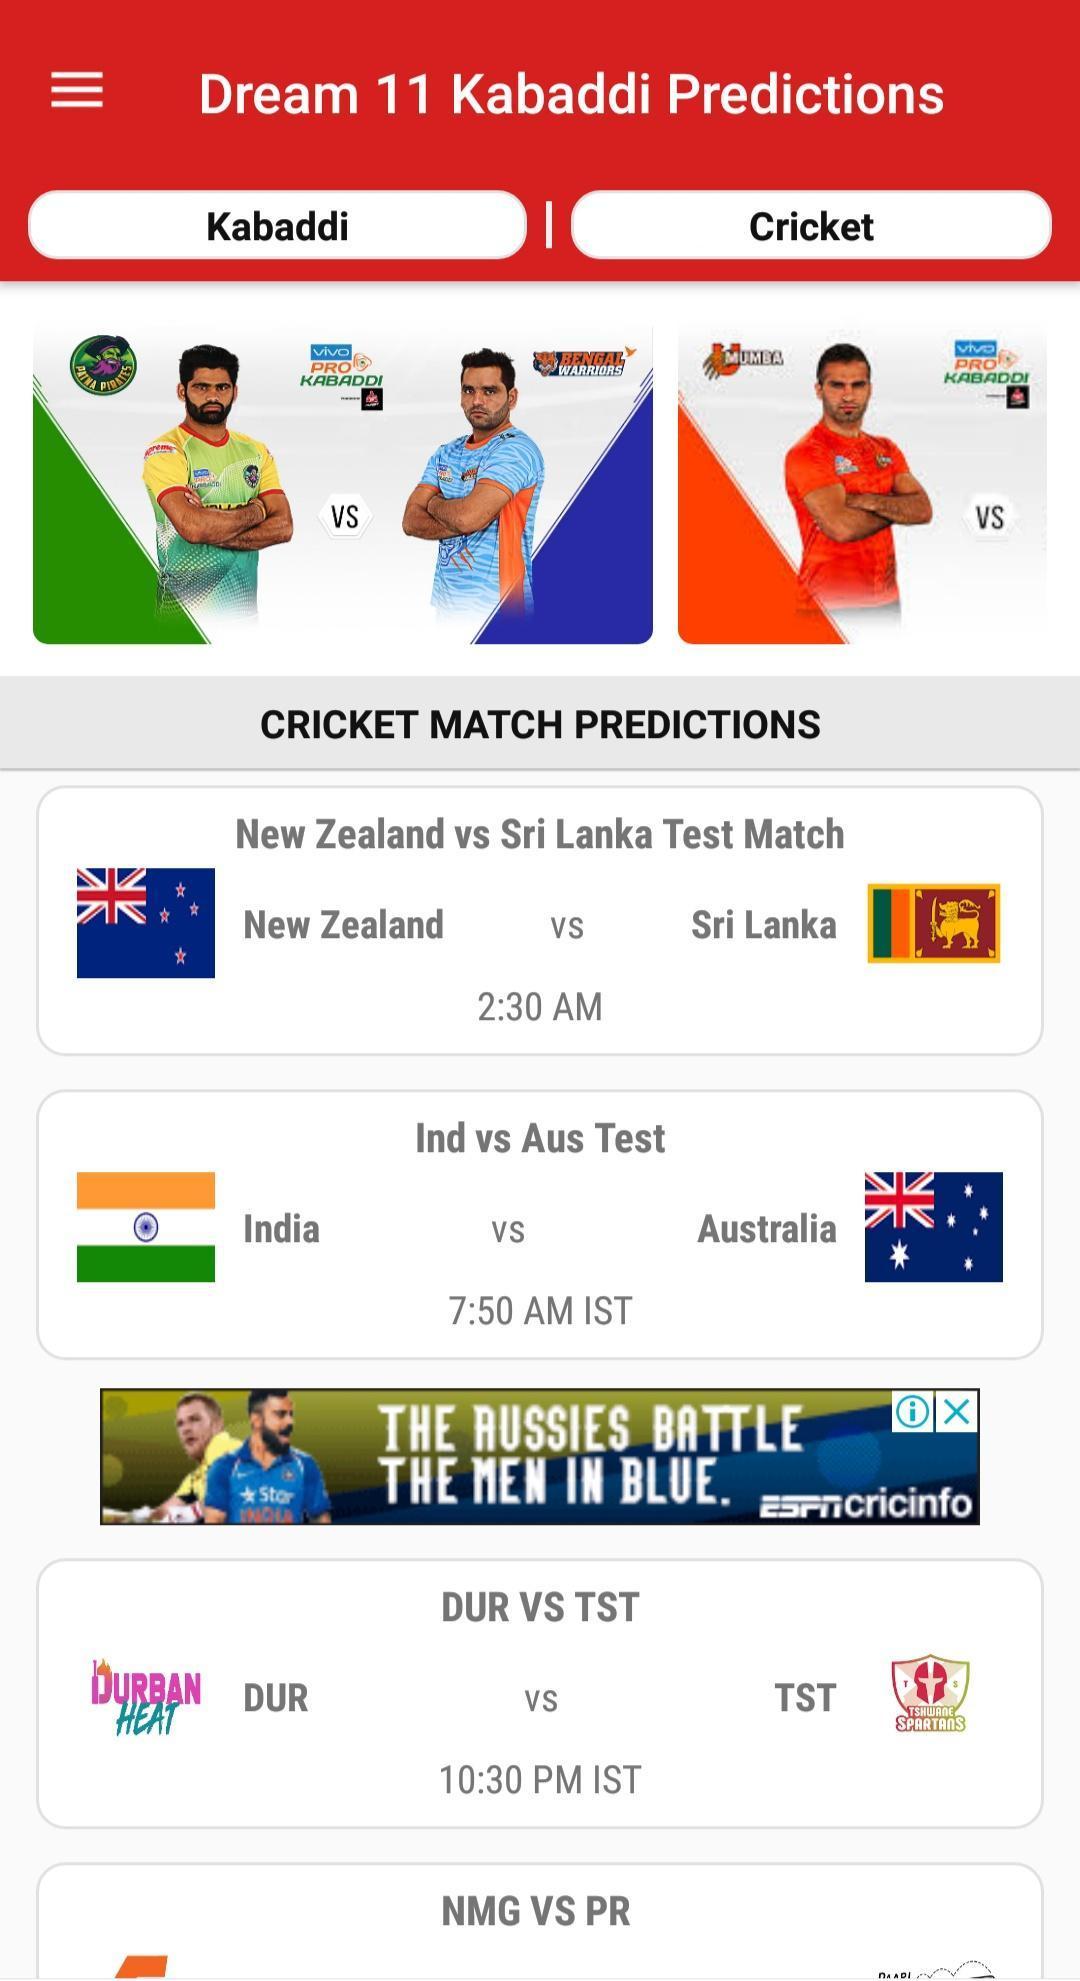 Dream11 Big Bash Cricket Predictions & Pro Kabaddi for